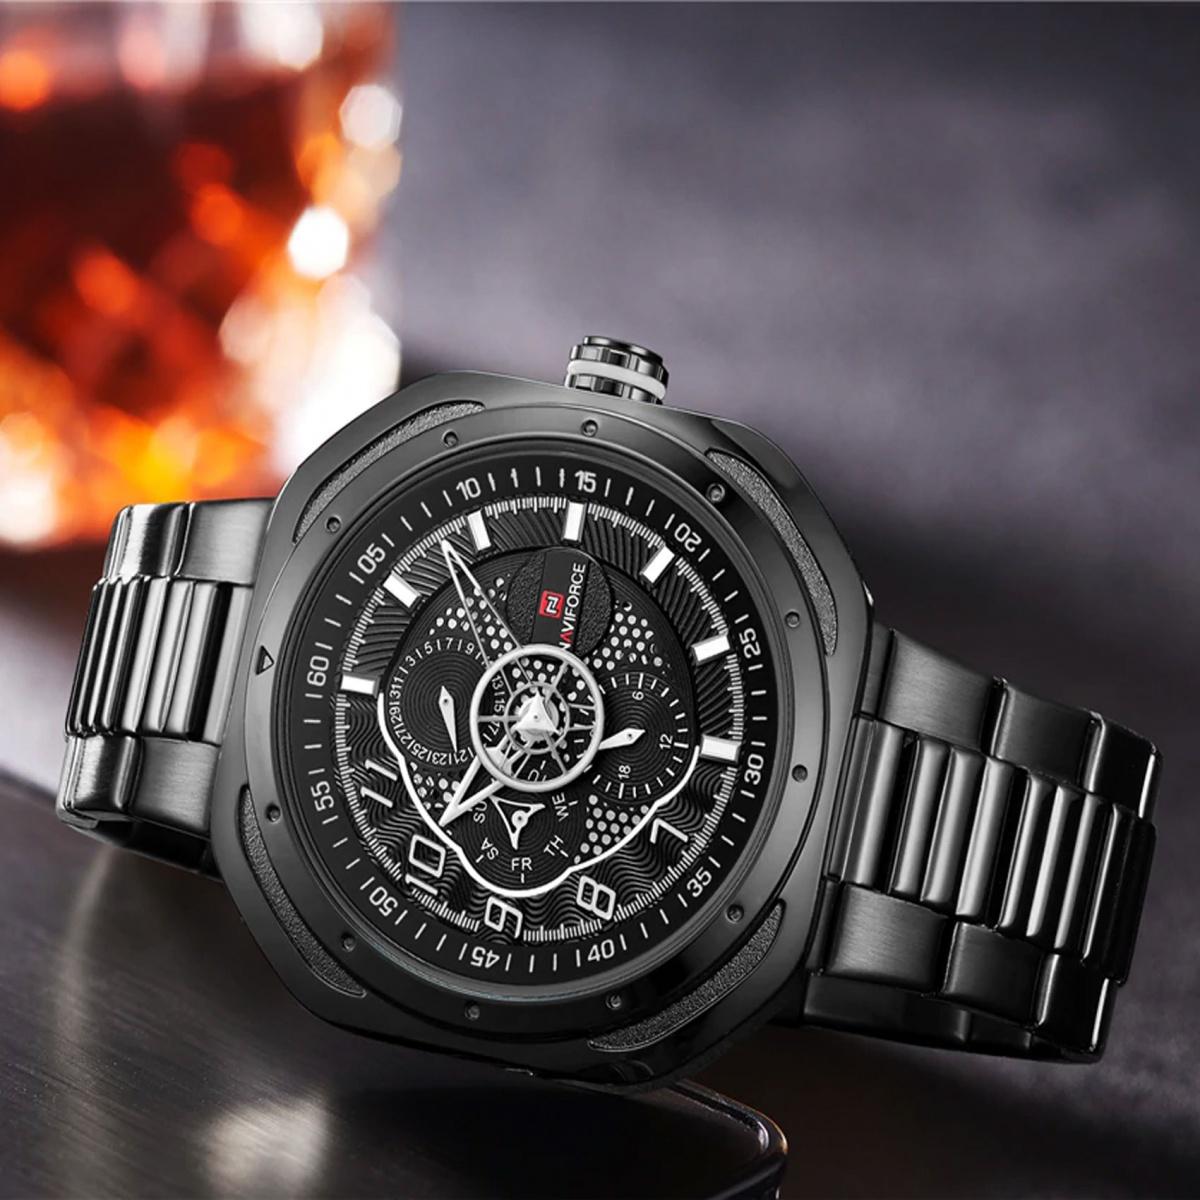 Naviforce LG9141SBWB Stainless Chrono Watch - Black